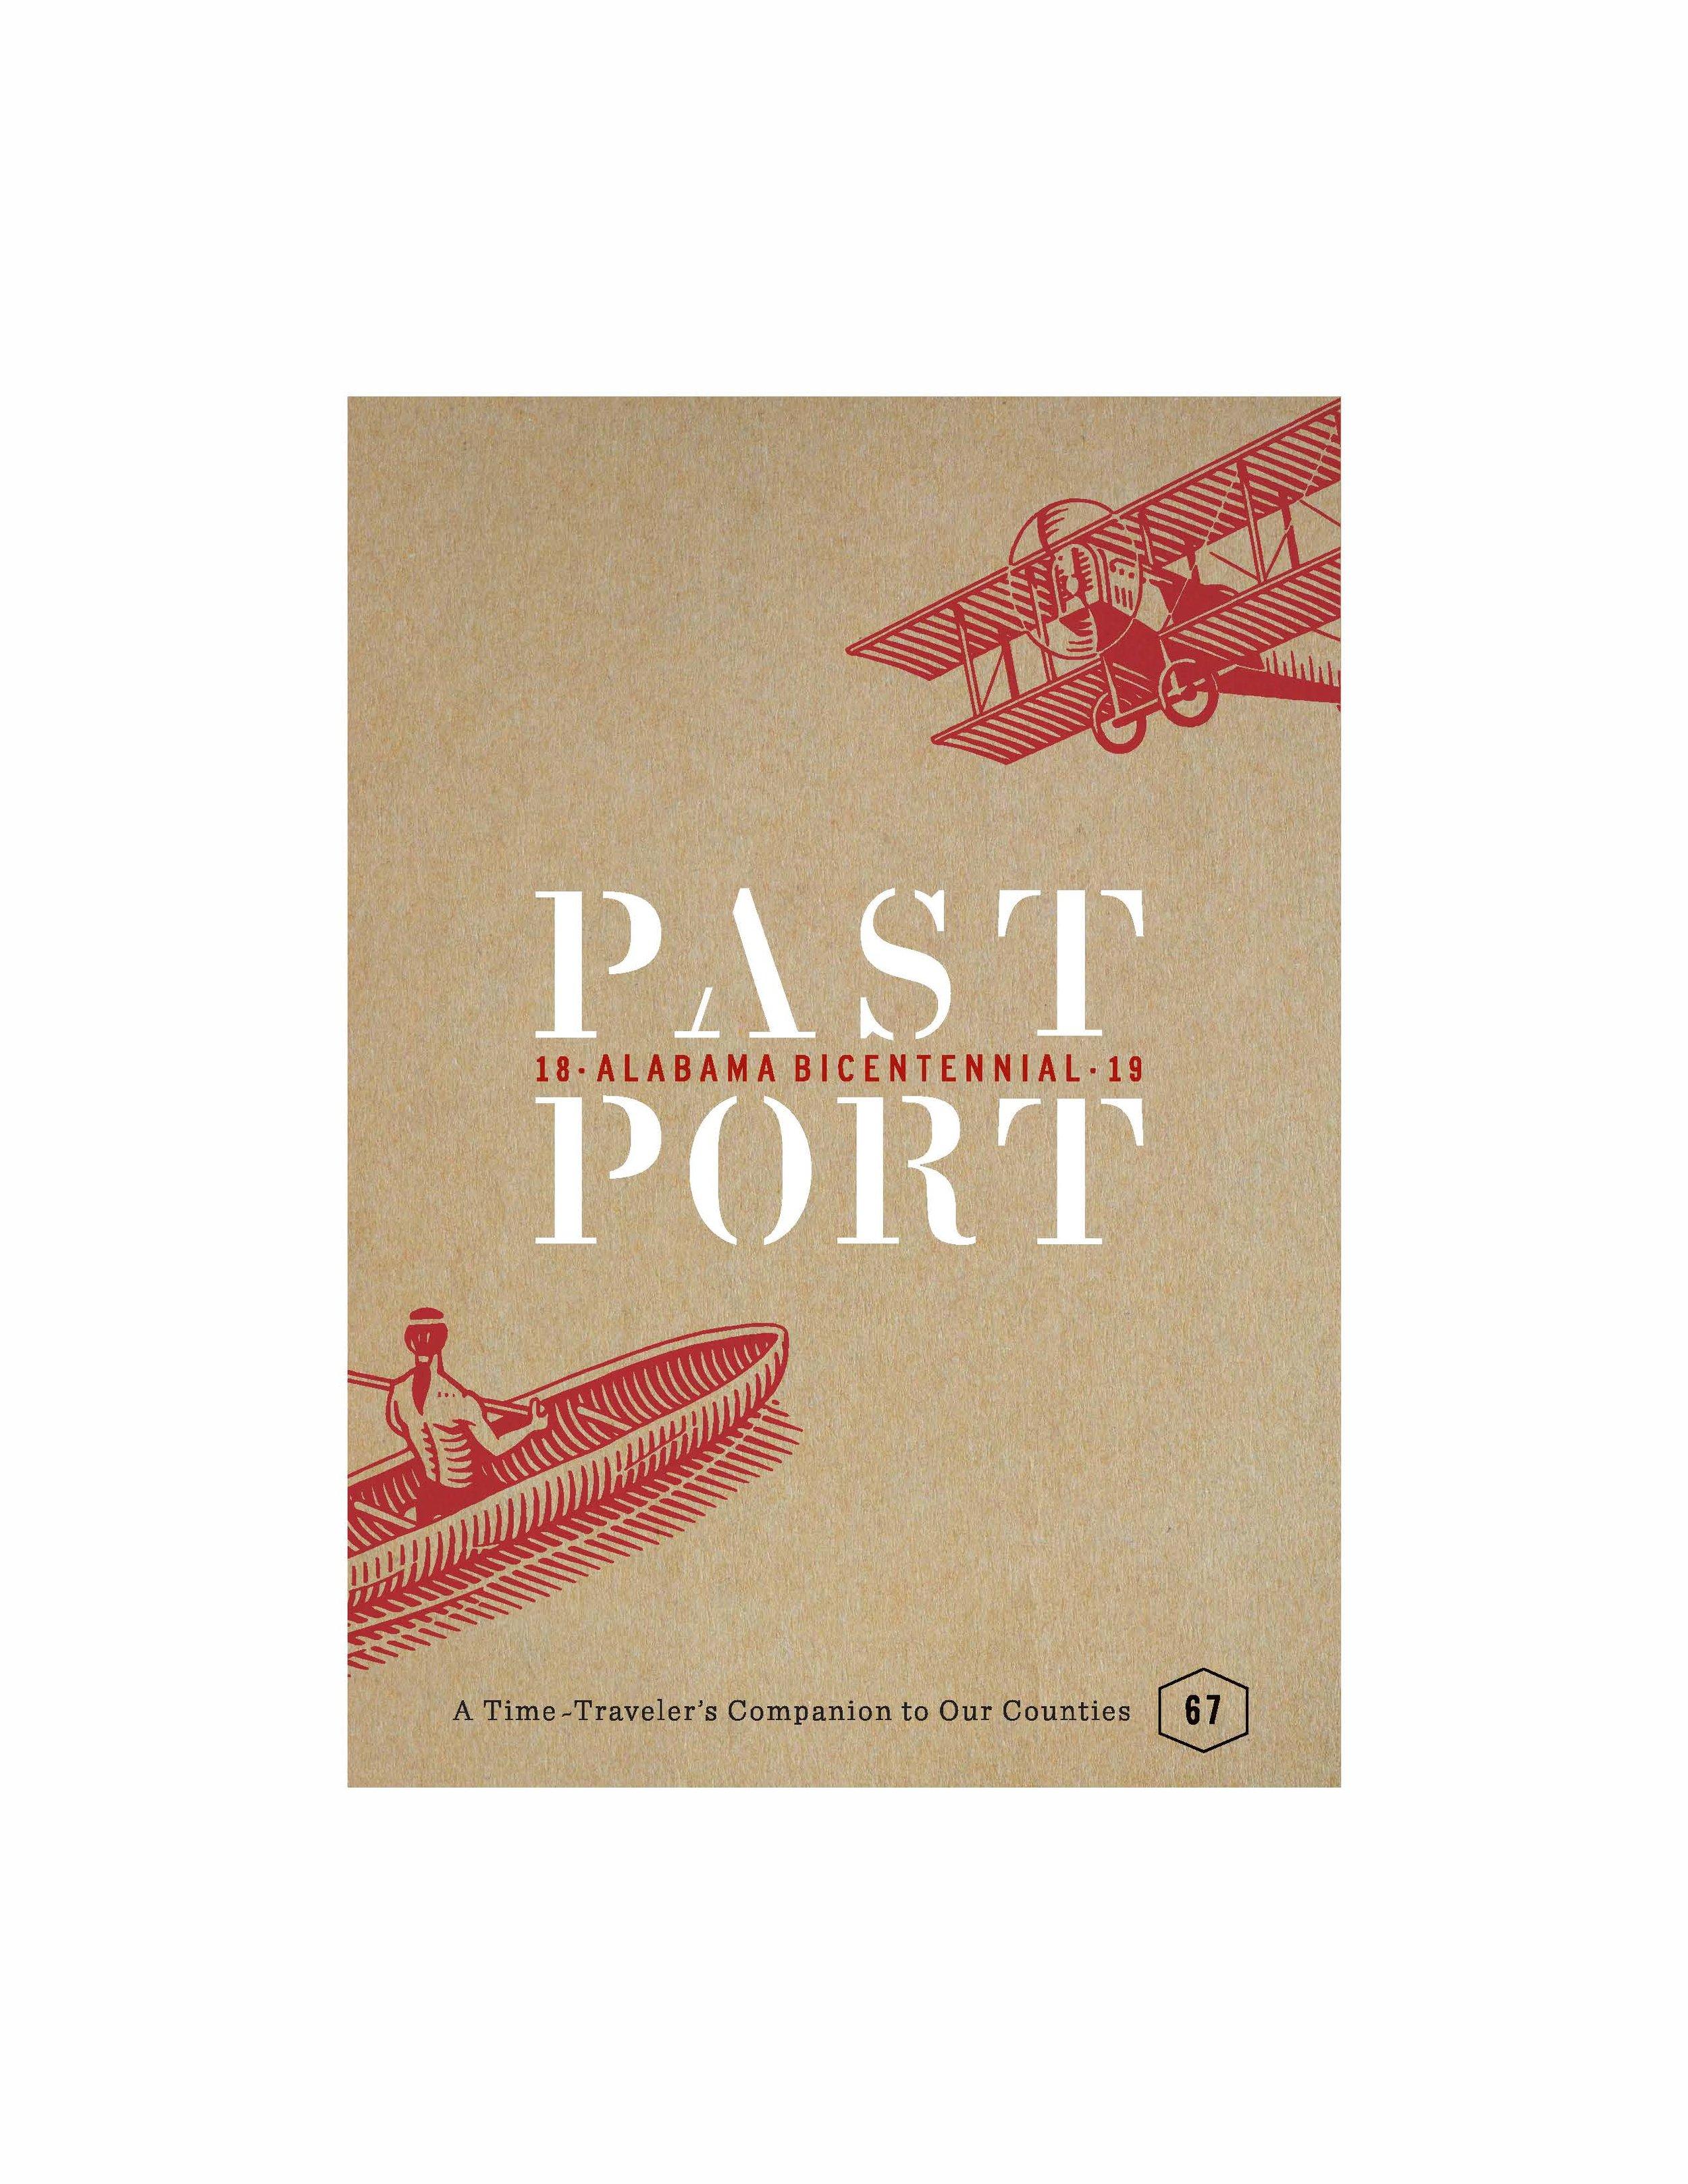 PastPort Cover High Res.jpg